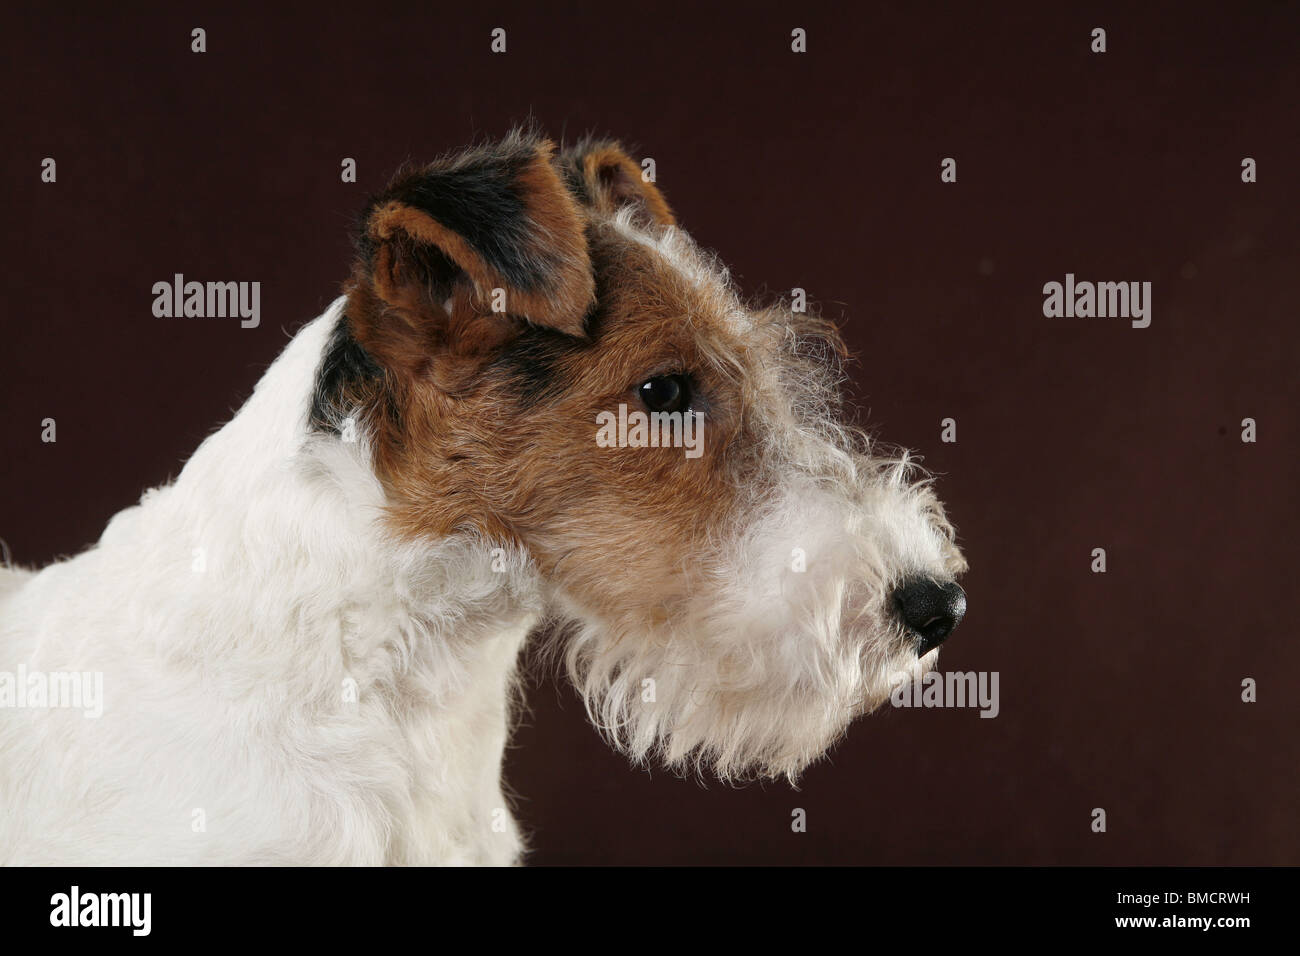 Charmant Draht Fox Terrier Züchter Galerie - Elektrische Schaltplan ...